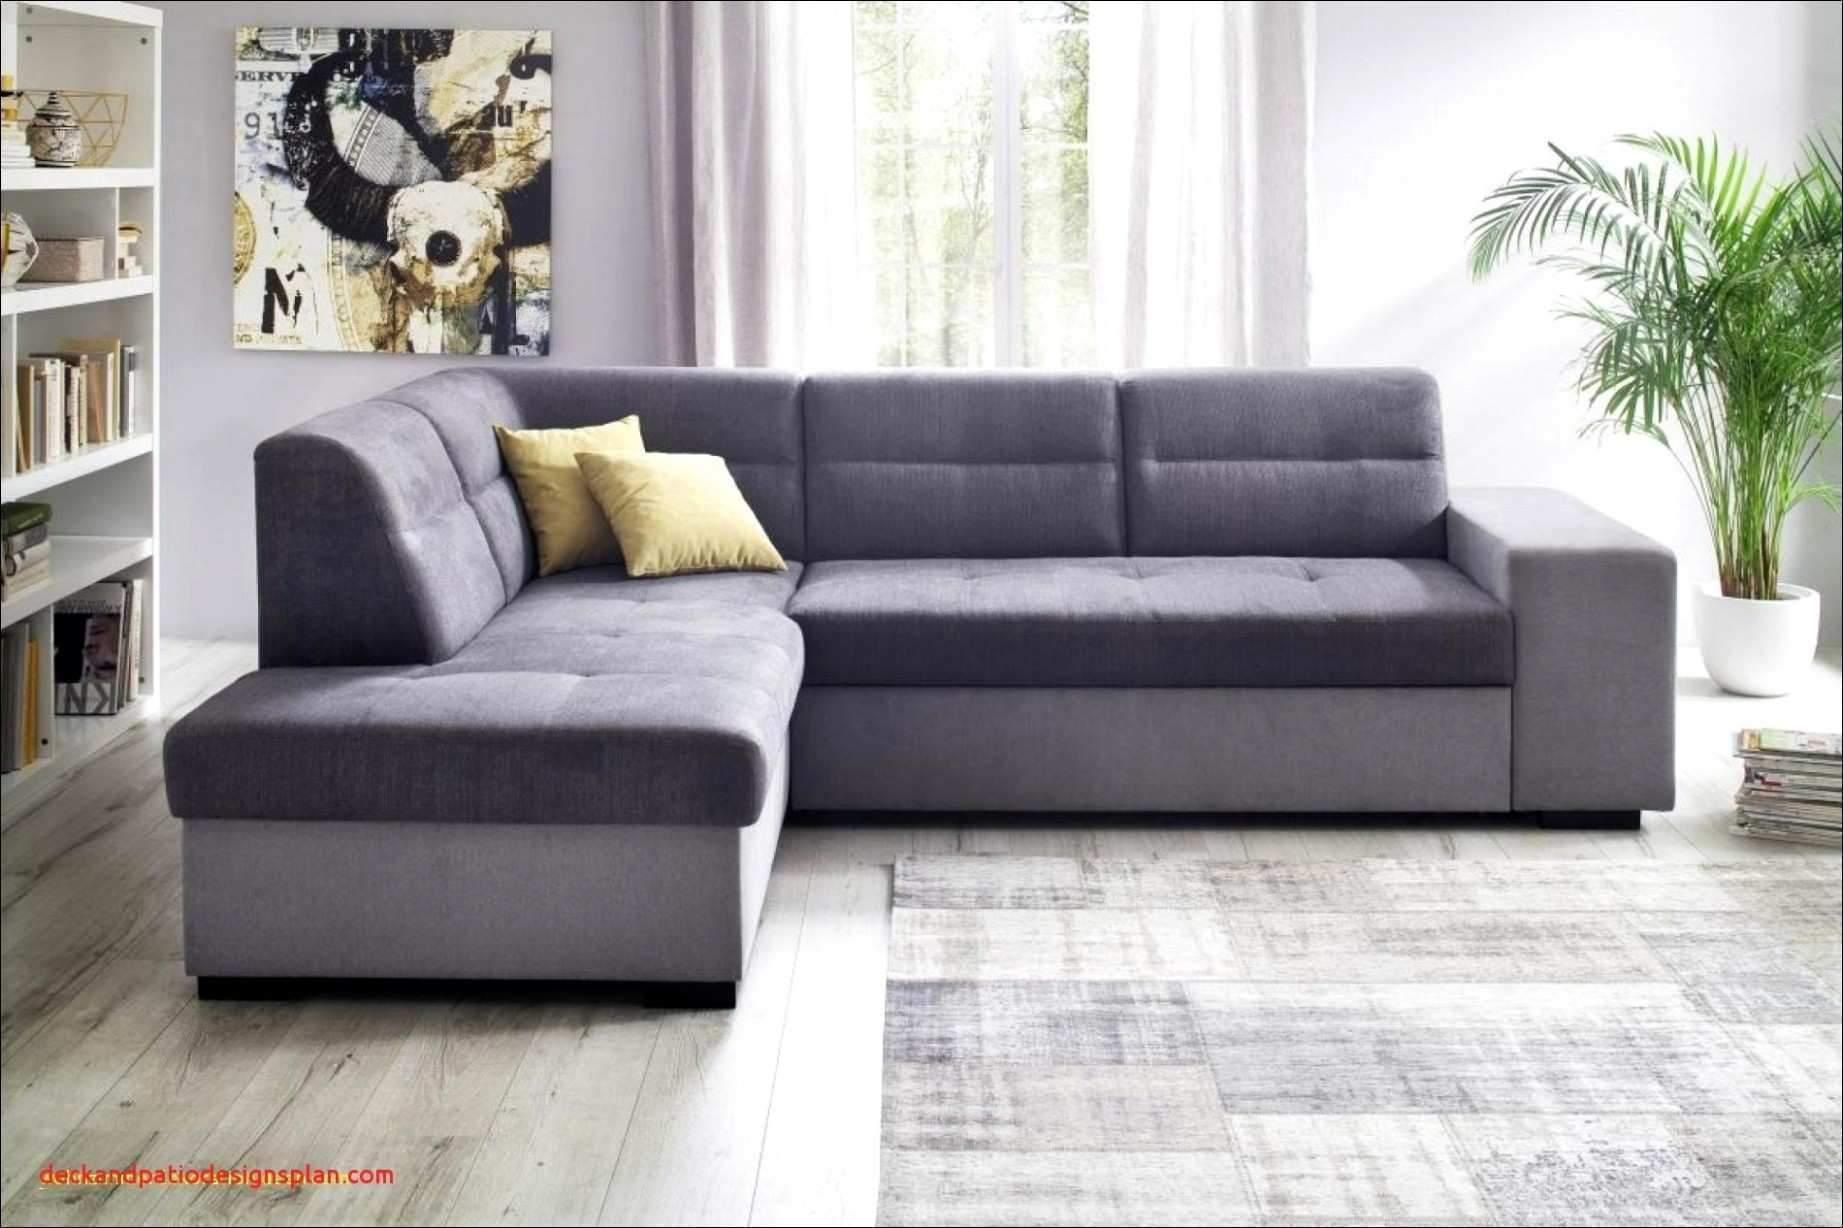 dekoideen wohnzimmer selber machen neu wohnzimmer deko selber machen ideen was solltest du tun of dekoideen wohnzimmer selber machen